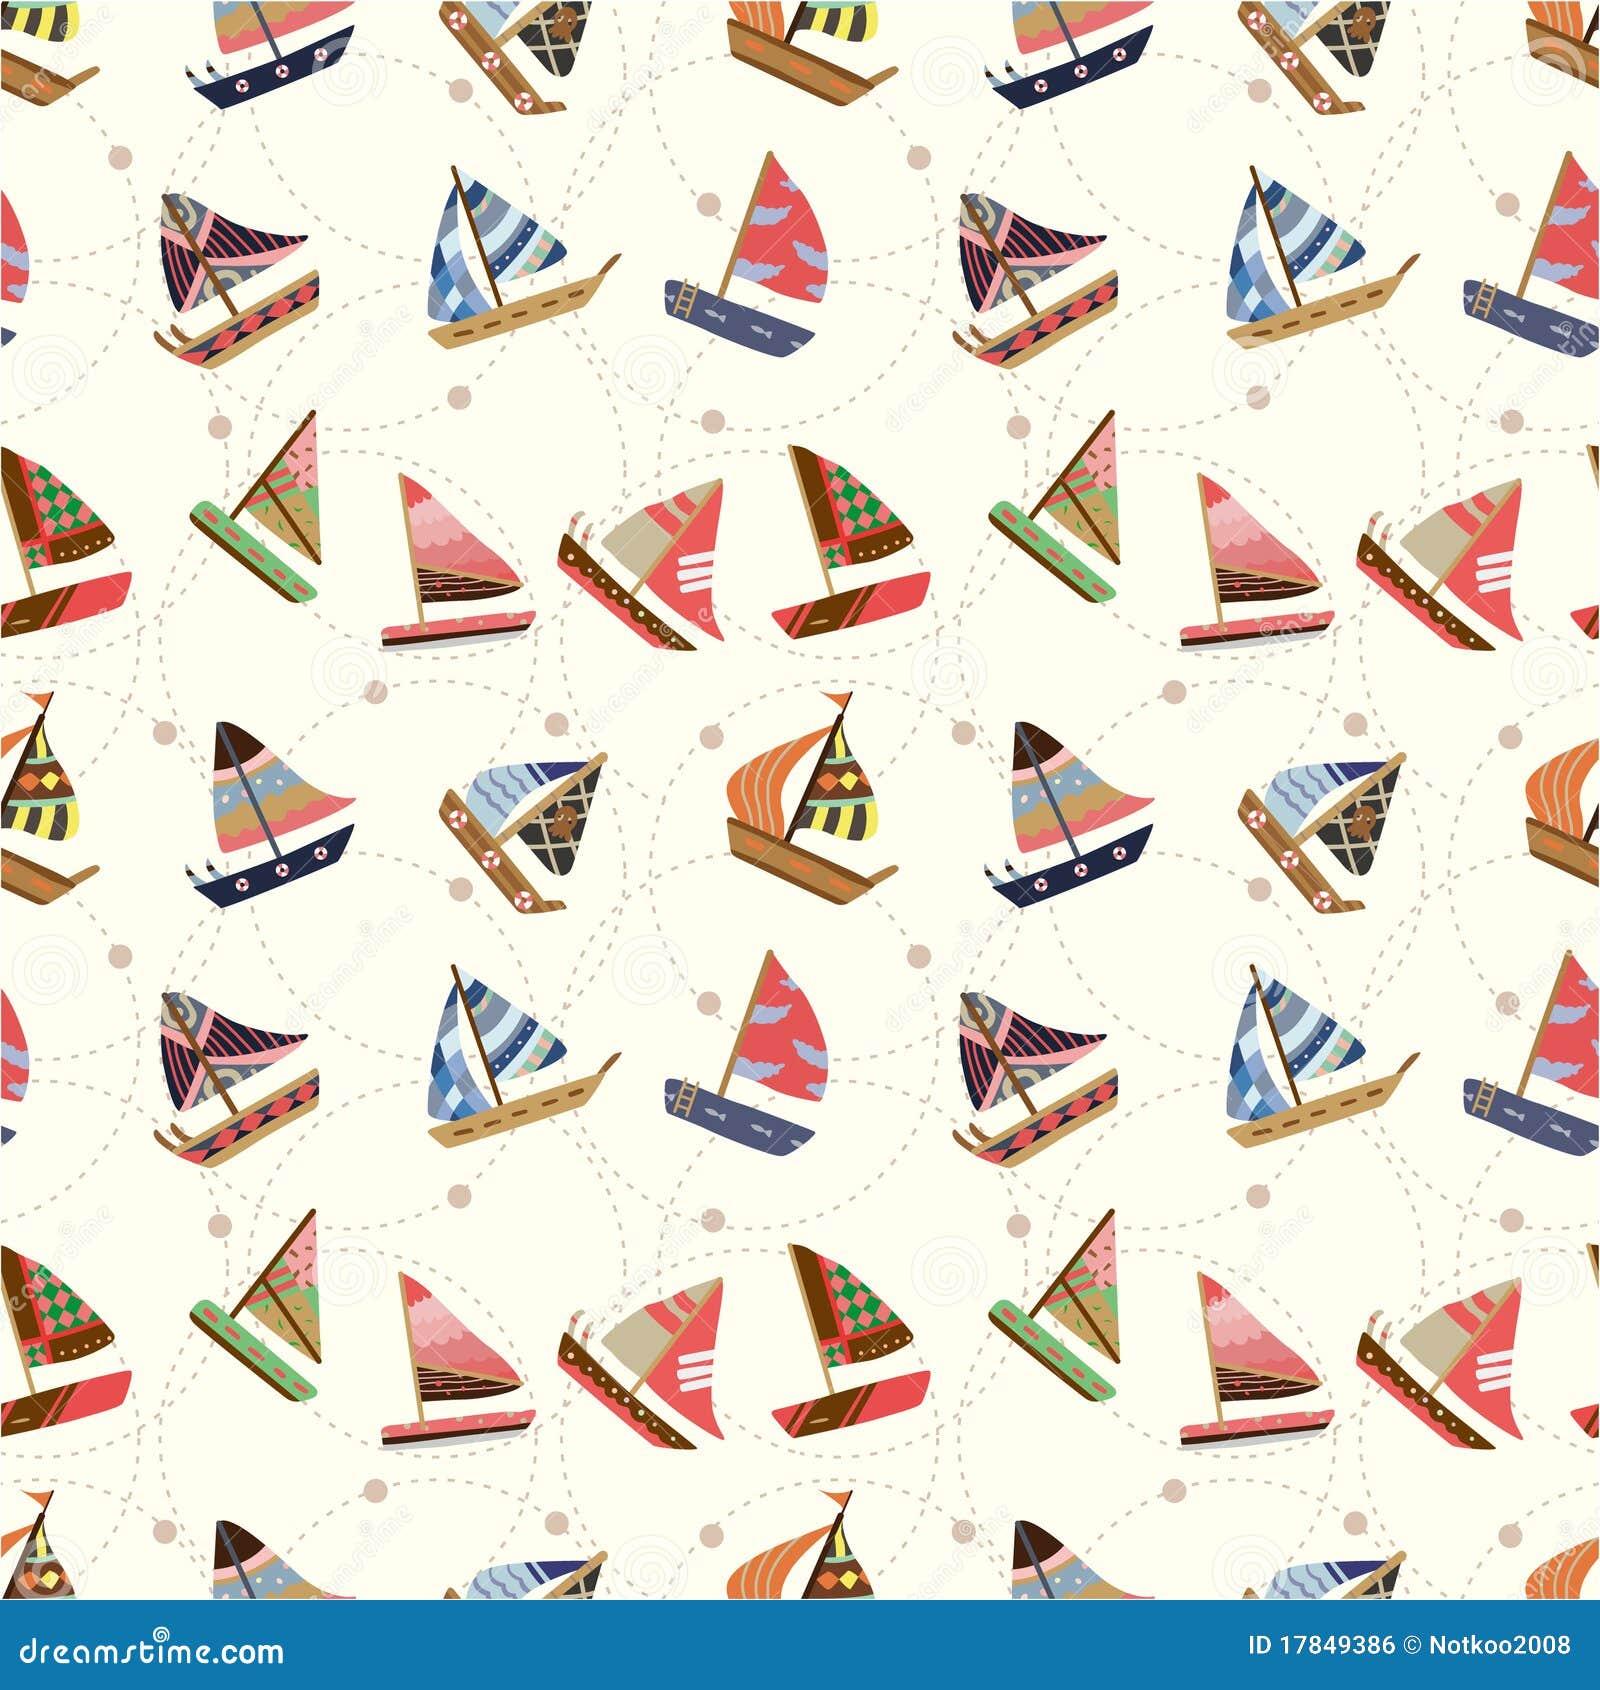 Seamless Sailboat Pattern Royalty Free Stock Image